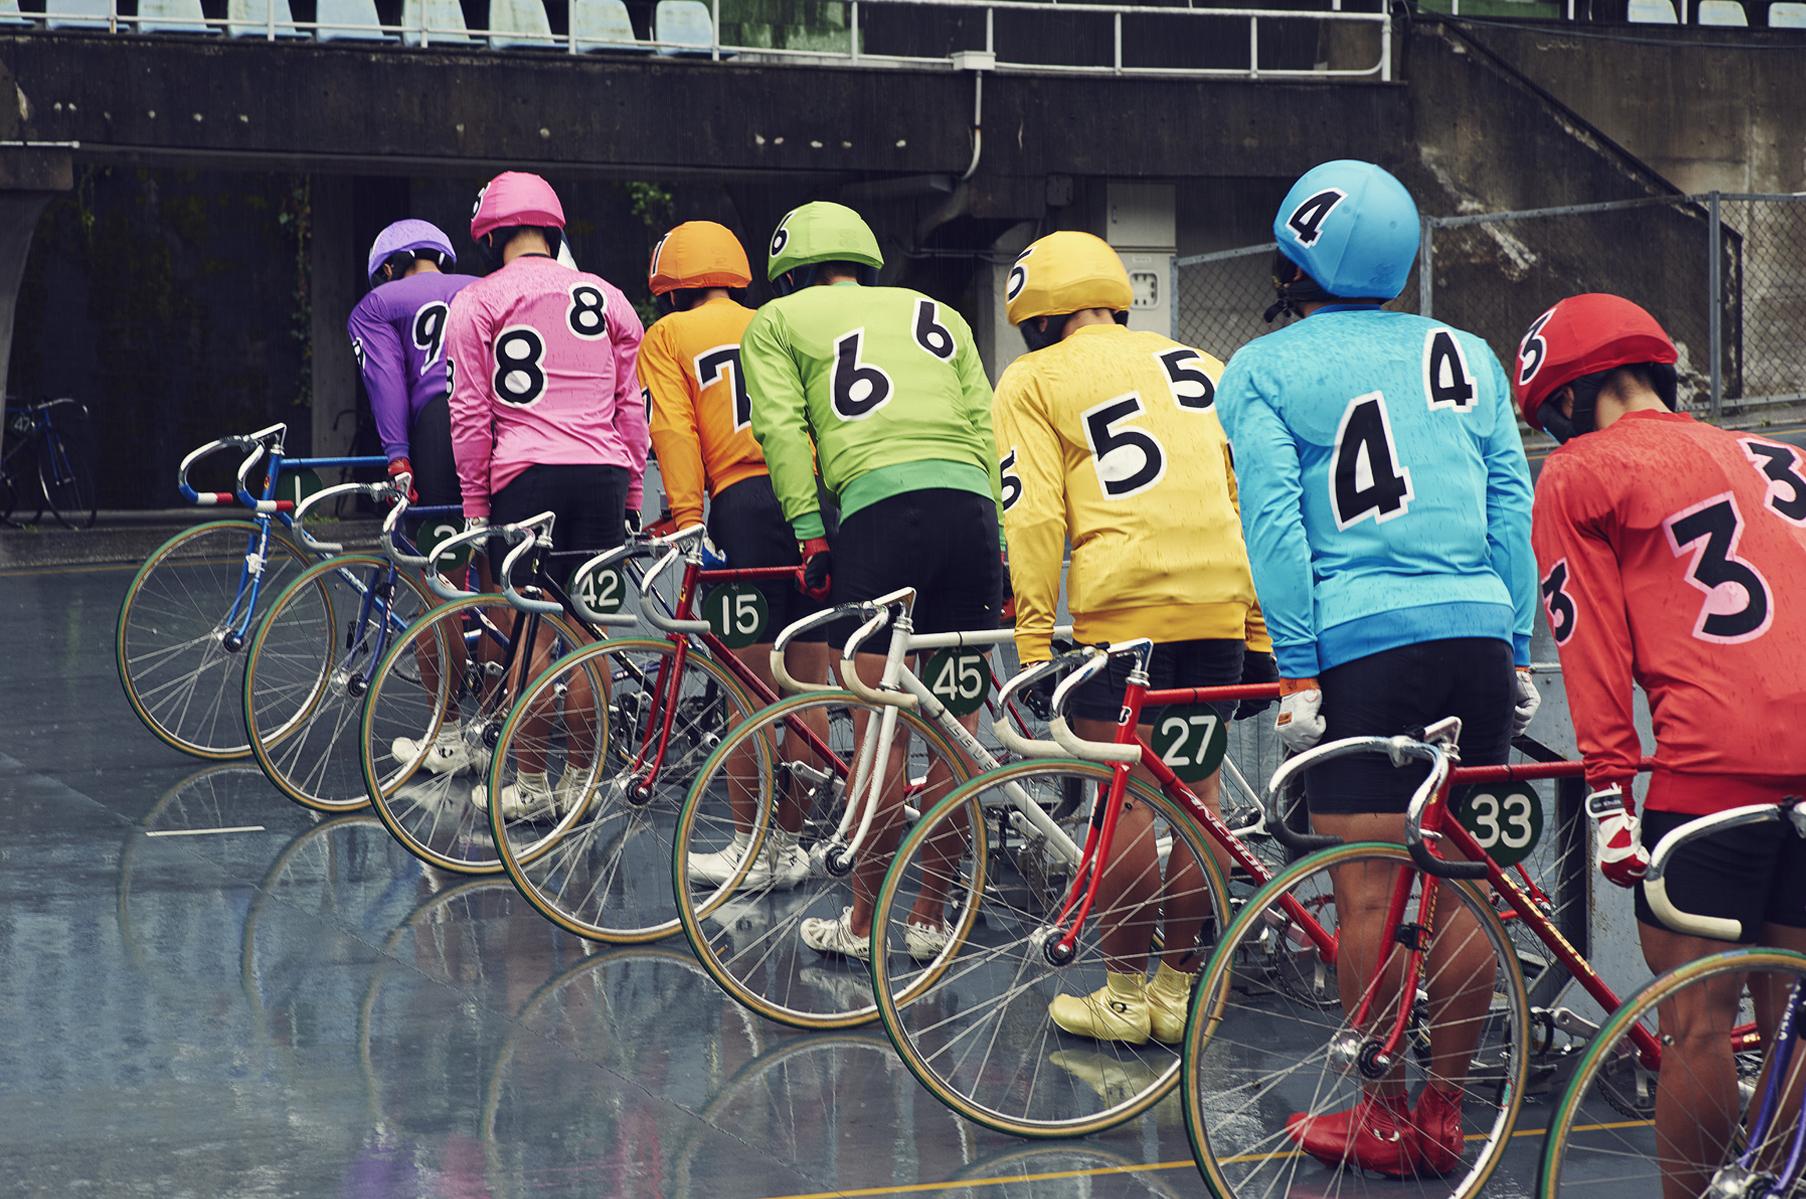 Issue 1, including Jasper Clarke's wonderful photos of Japan's keirin racing academy.